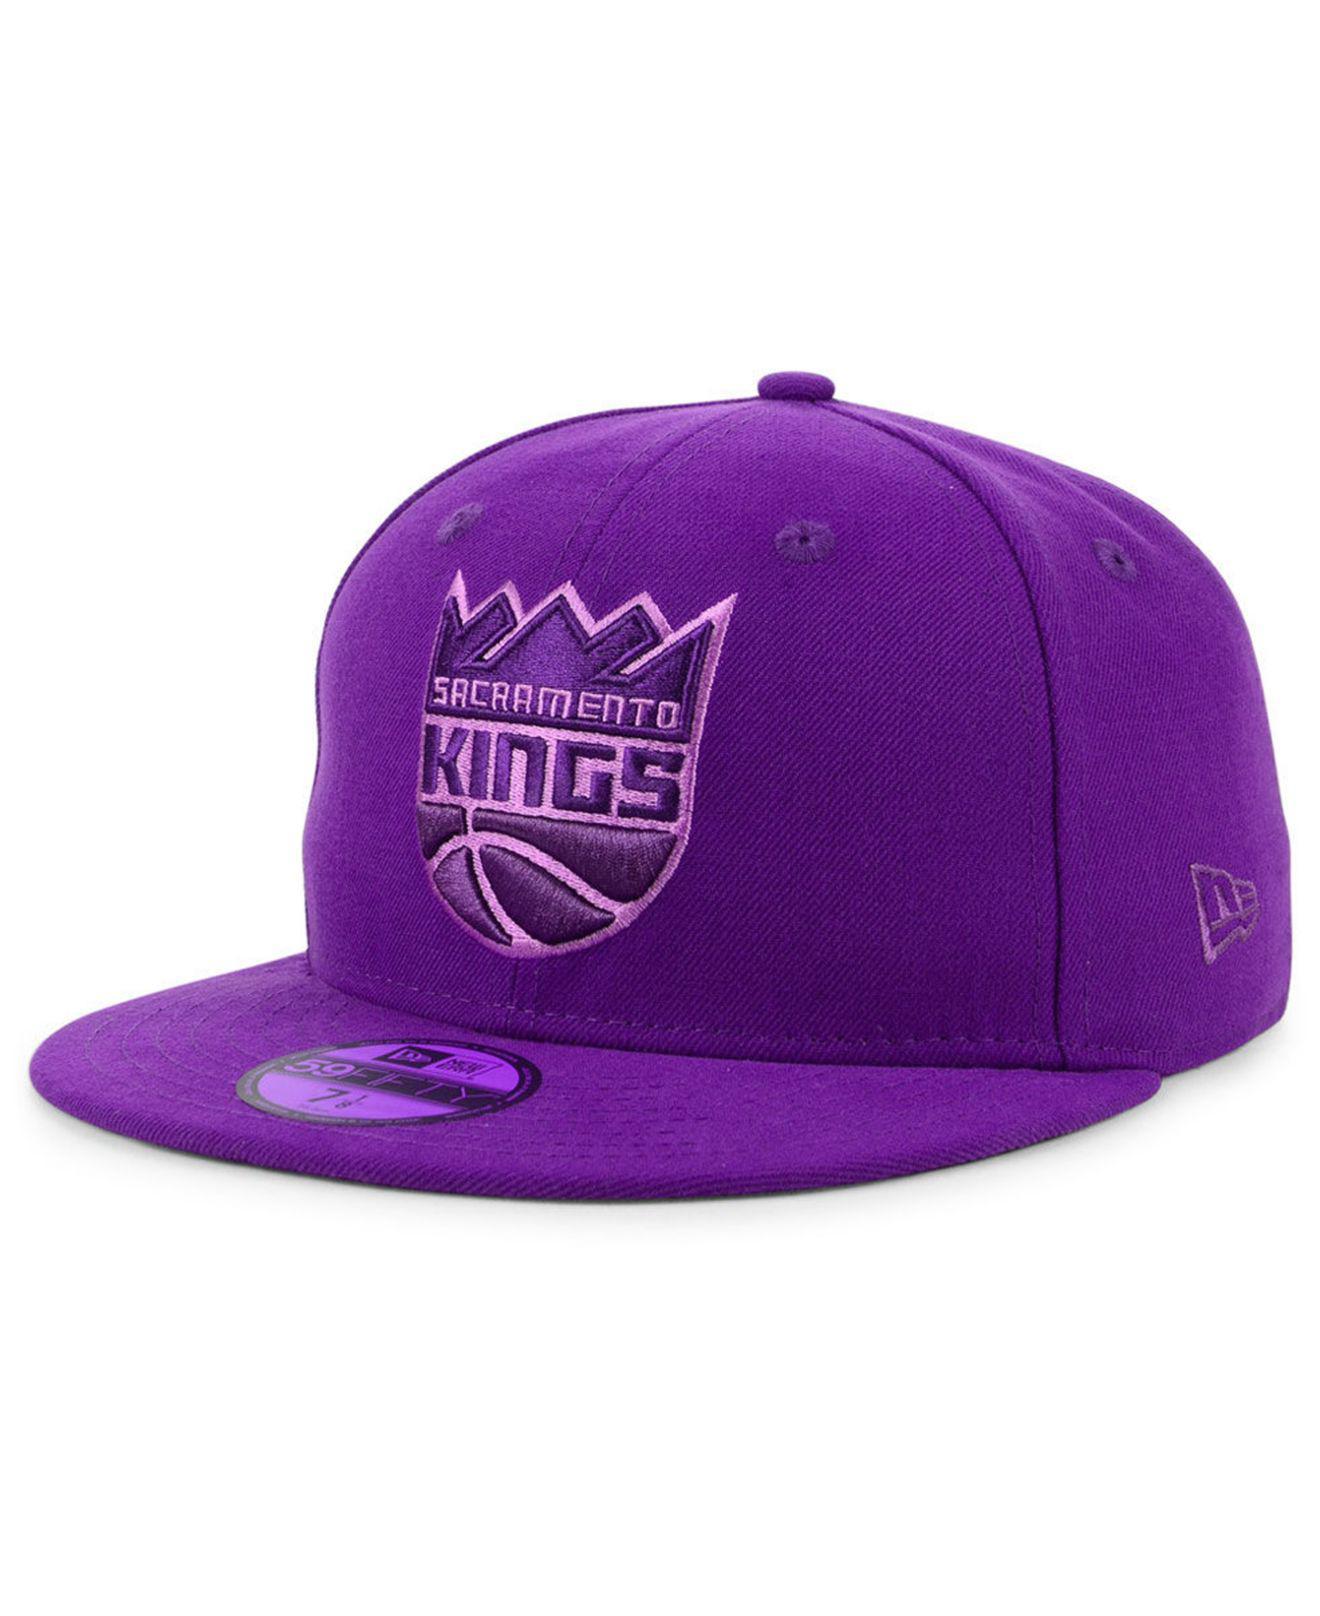 ... mitchell ness nba xl logo snapback e478a f08e6  canada ktz. purple sacramento  kings color prism pack 59fifty fitted cap b9a34 6627a 13a0e8674ea4